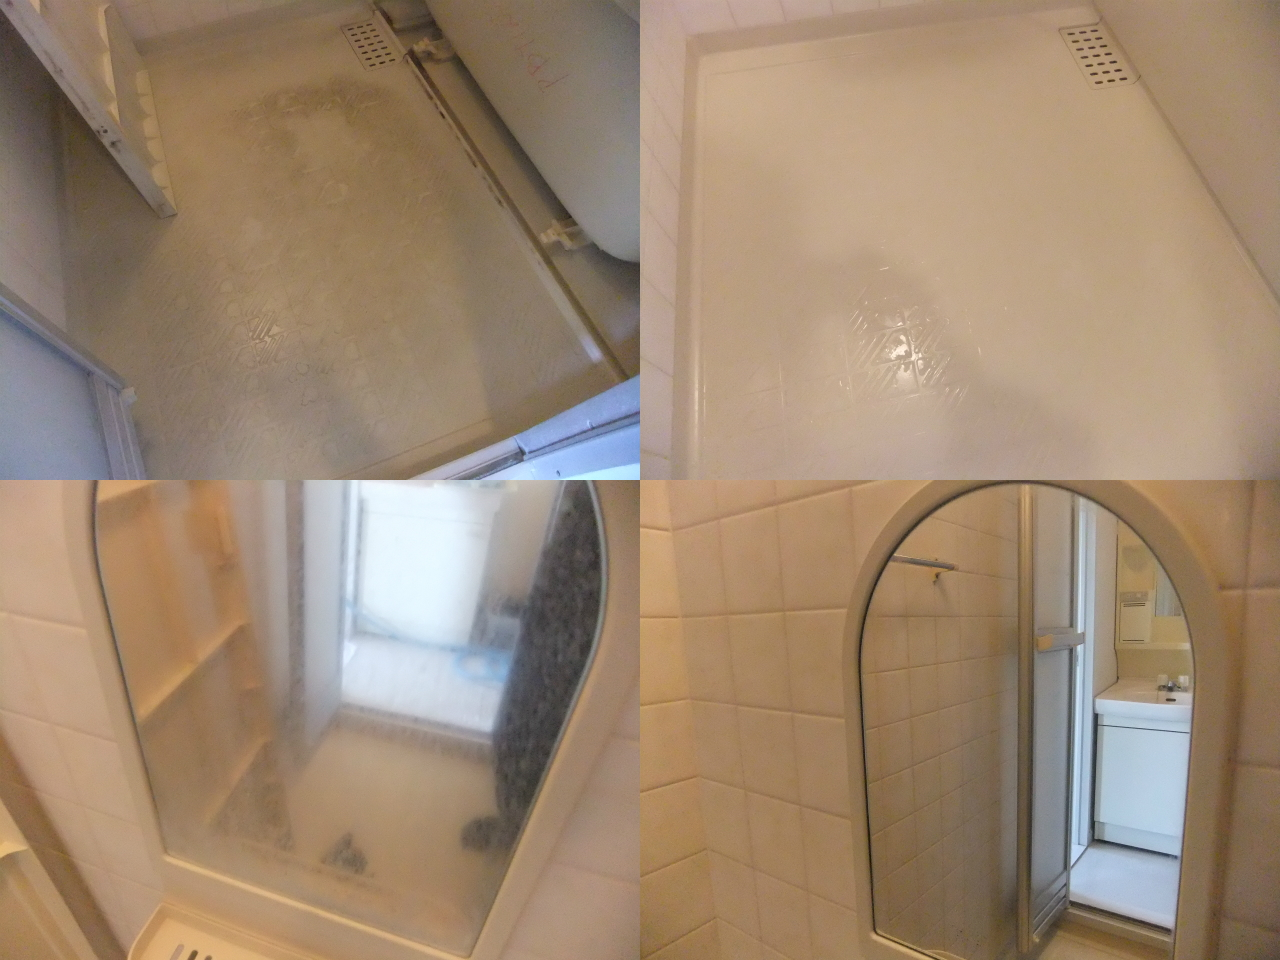 http://ajras.net/images/120402-bathroom.jpg